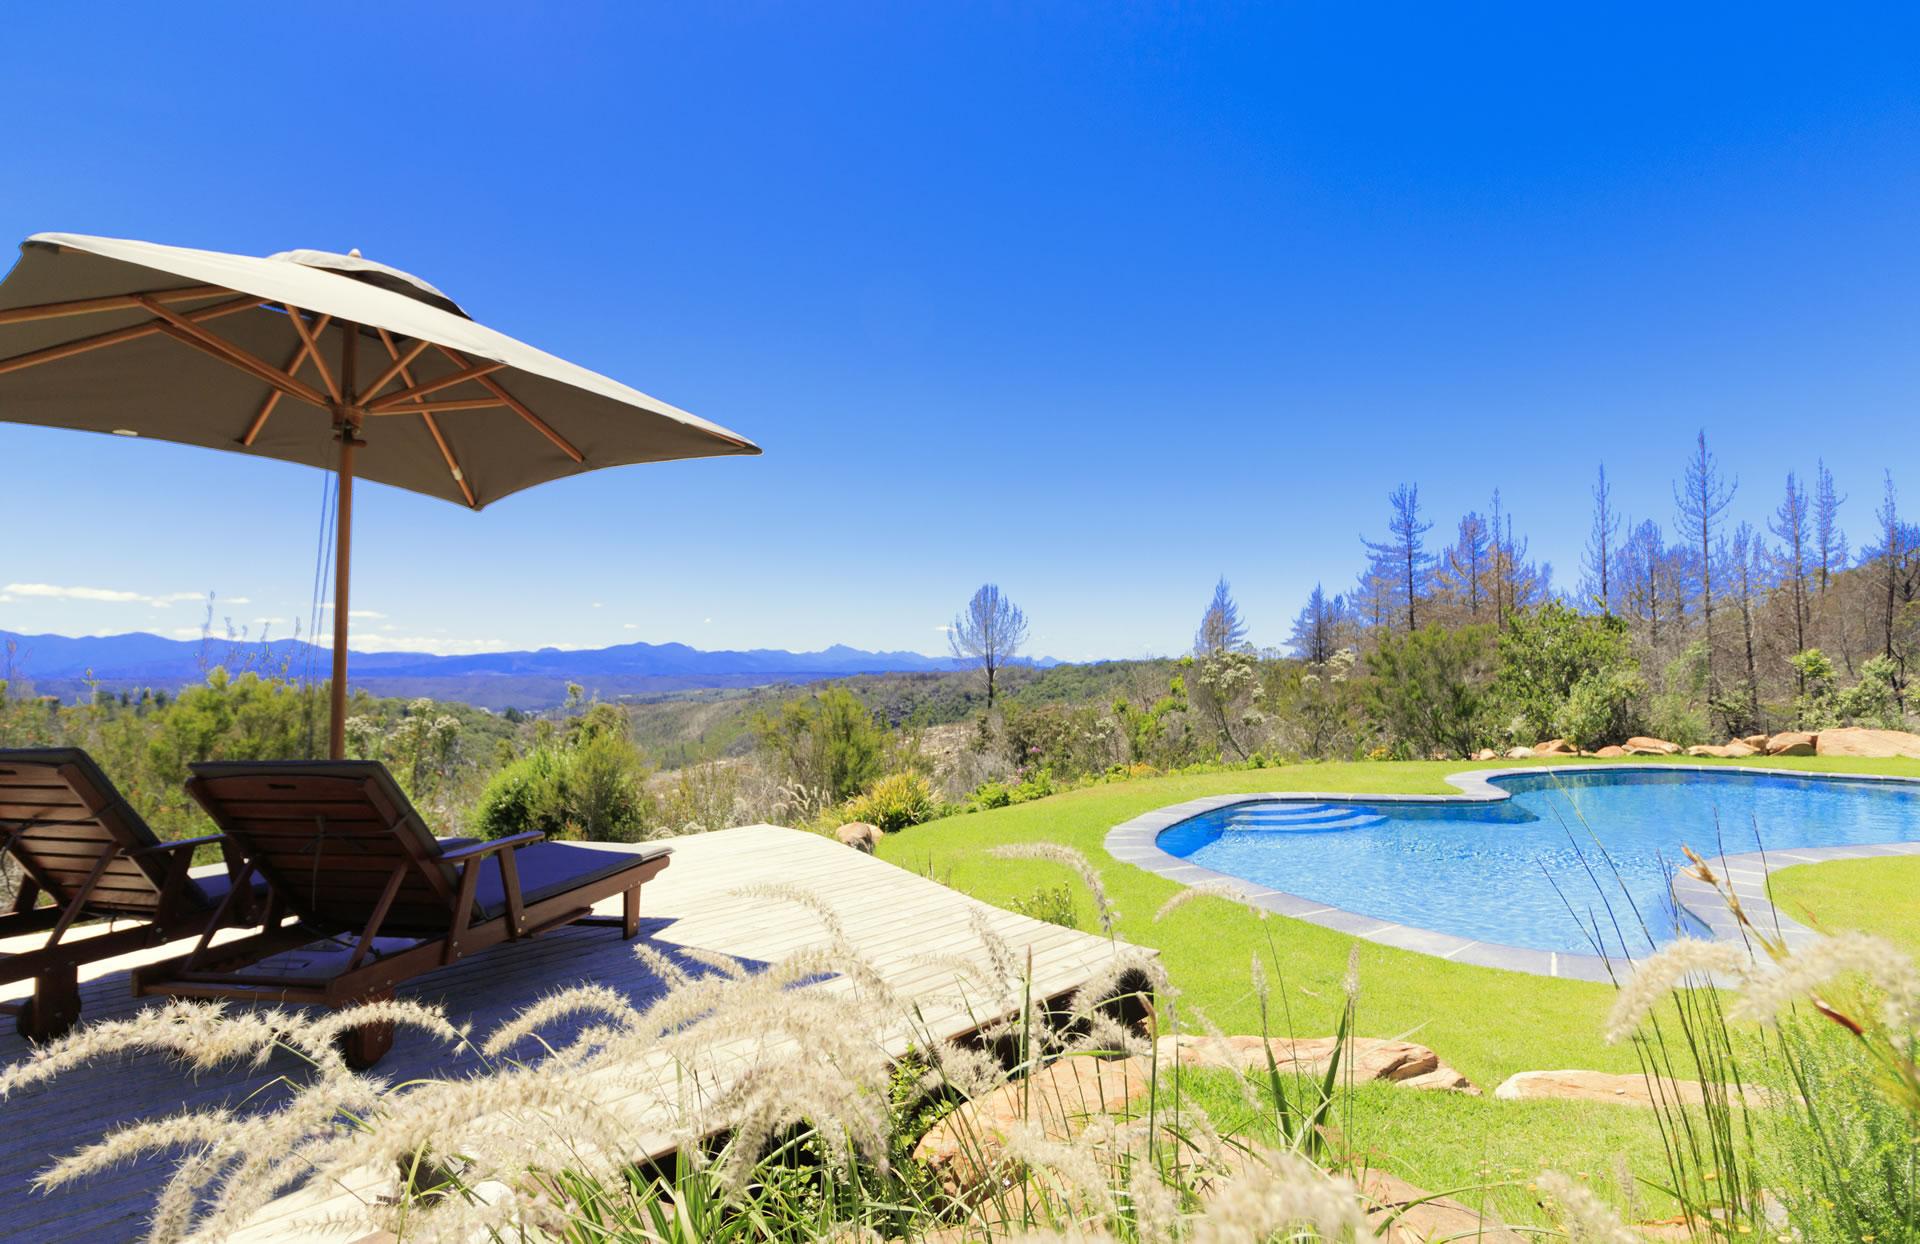 fynbos ridge guest house bed and breakfast accommodation Plett - pool